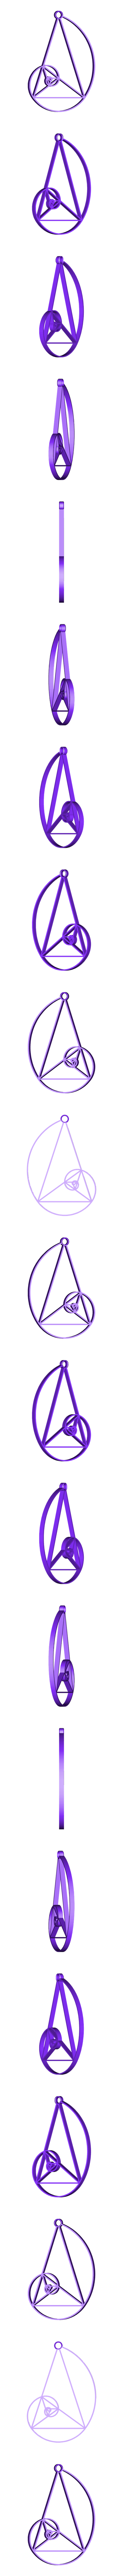 LogaSpiral90mm.stl Download free STL file Logarithmic Spiral, Golden Triangle, Golden Gnomon, Spira Mirabilis • 3D print object, LGBU